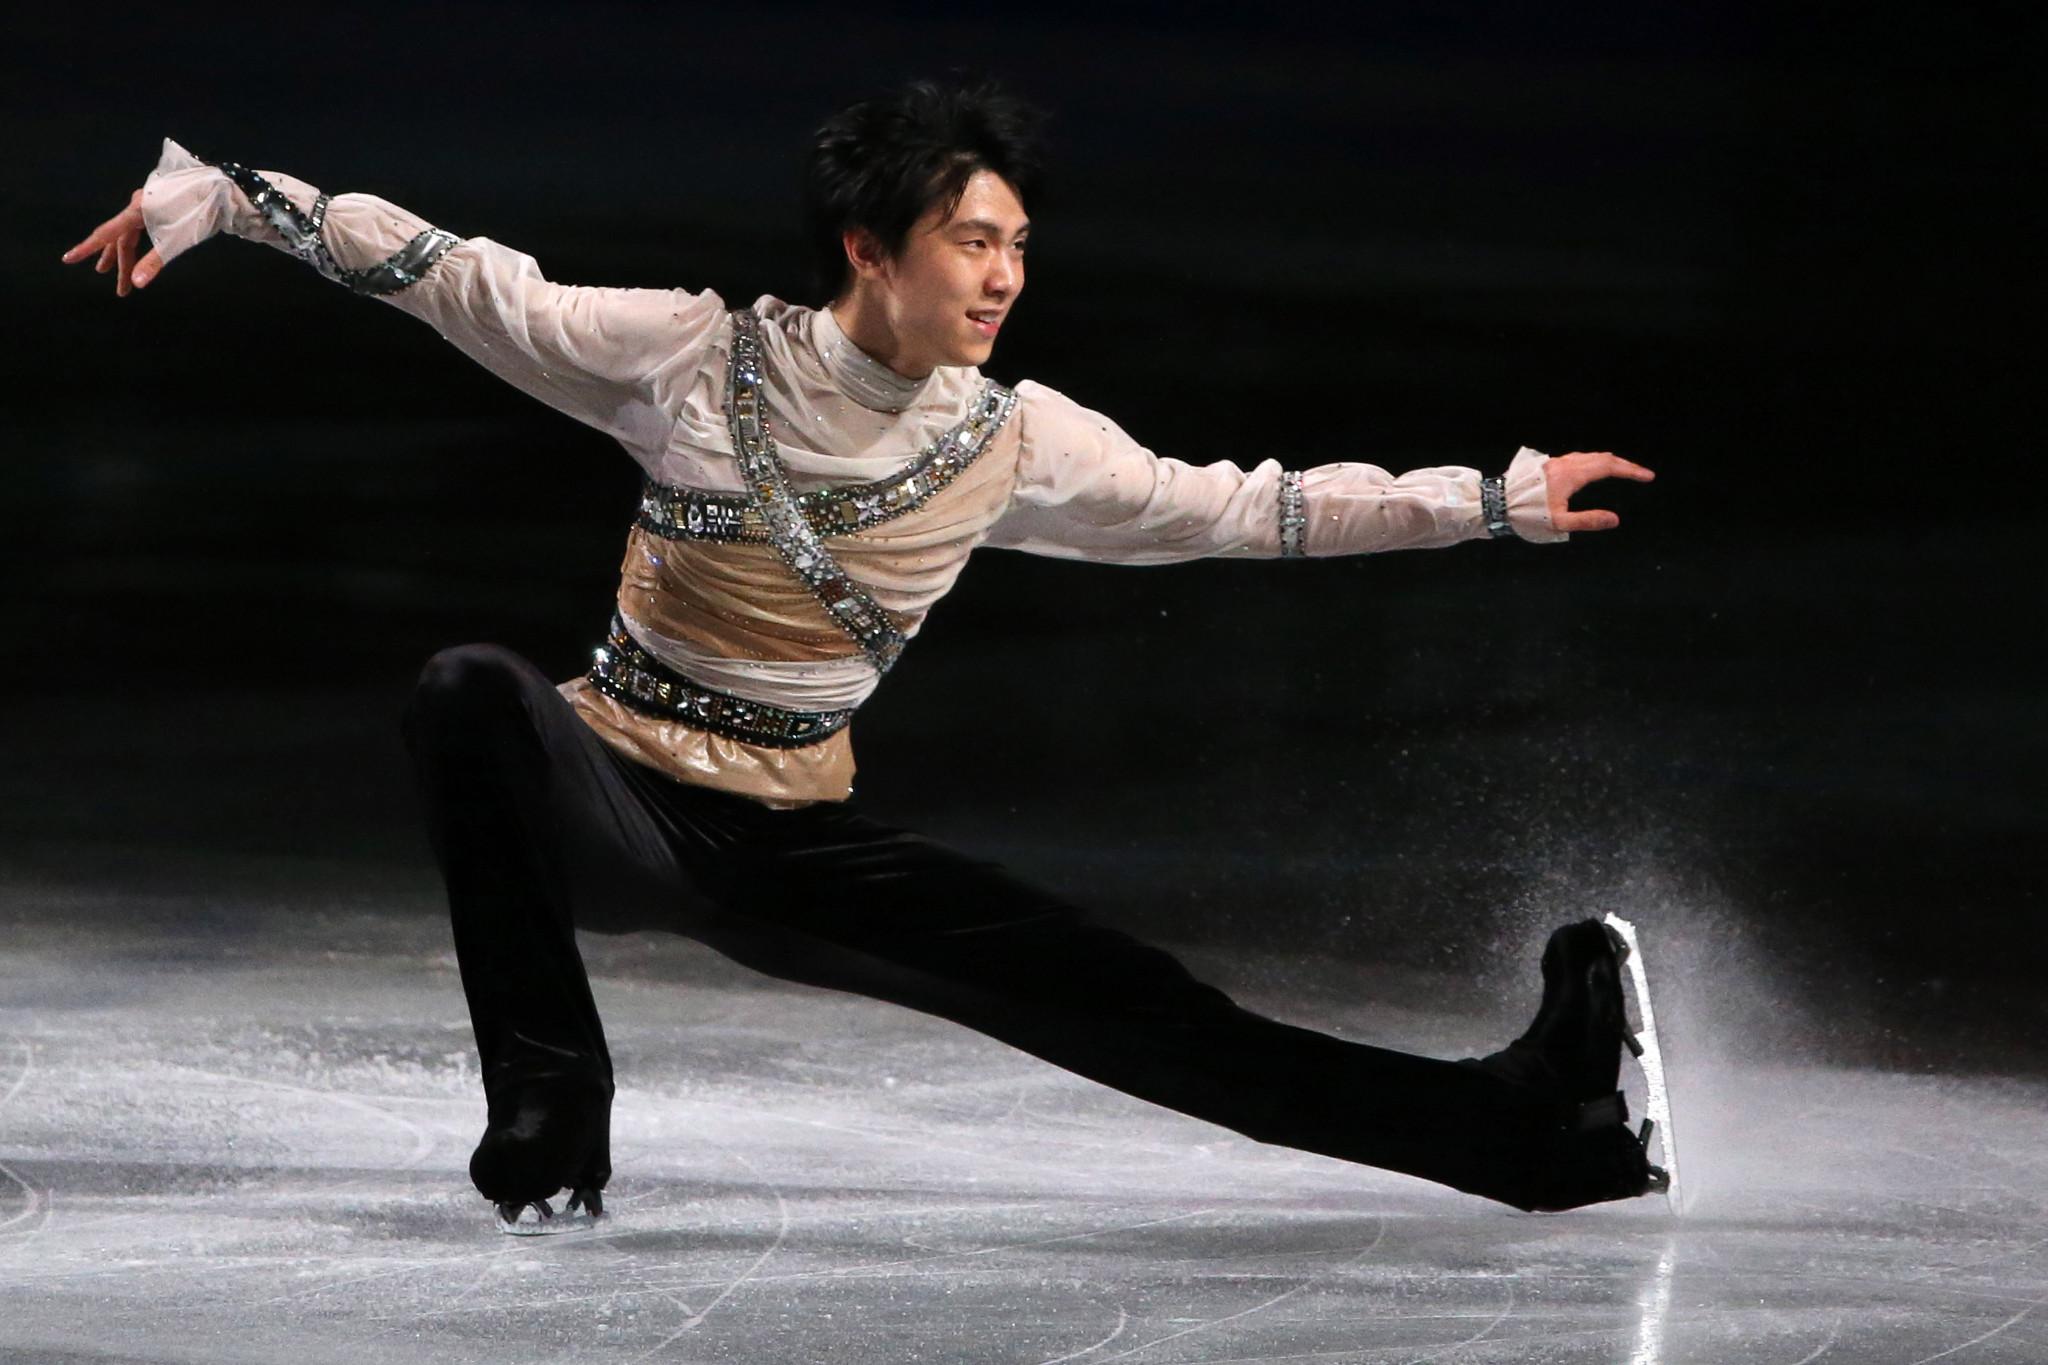 Yuzuru Hanyu won the men's singles title in Saitama in 2014  ©Getty Images